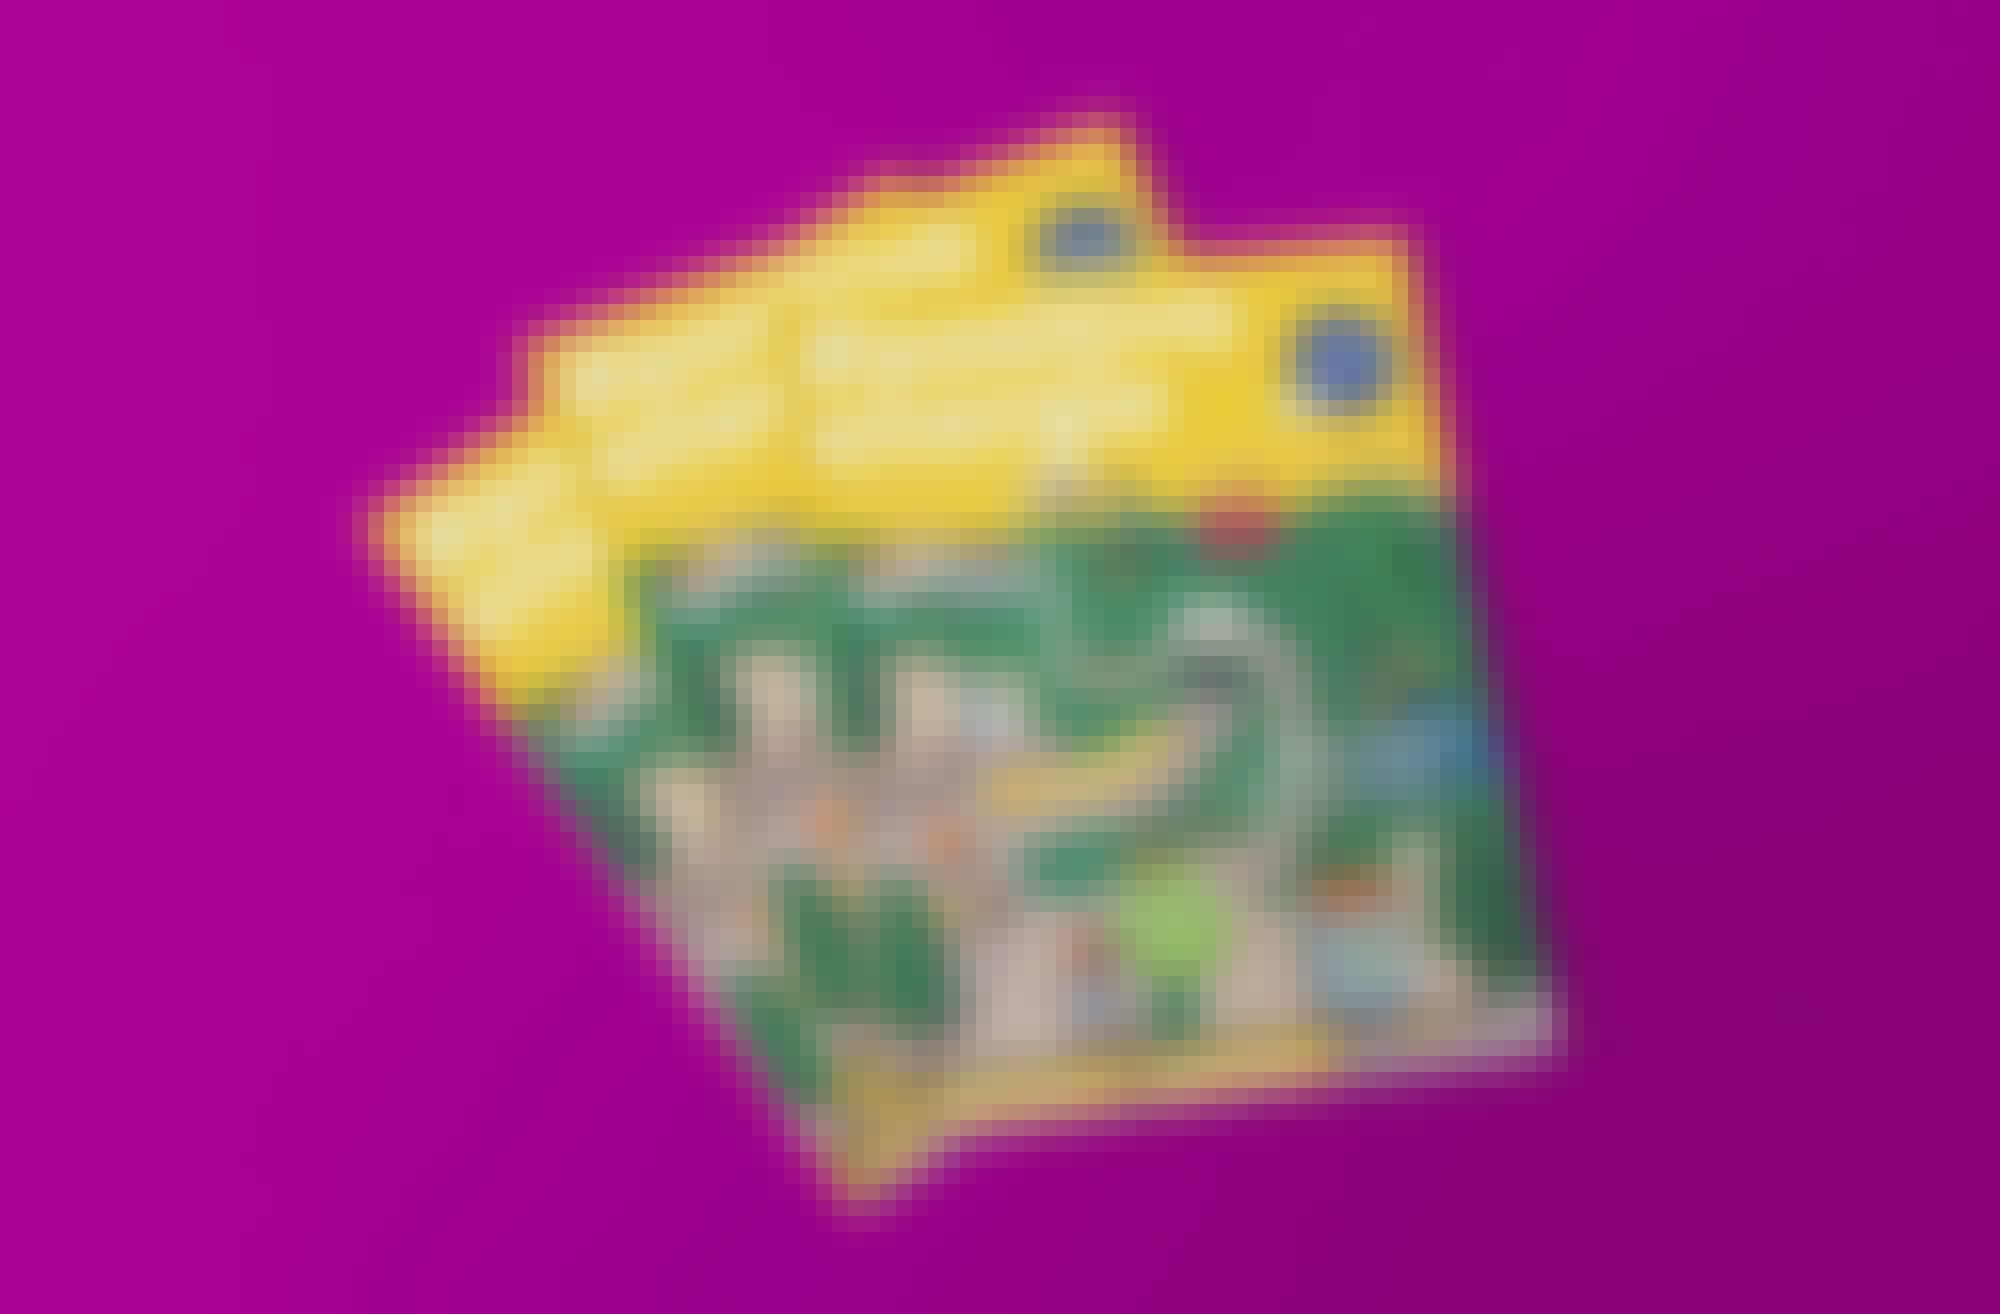 magazine-mockup-01-purple-2.jpg